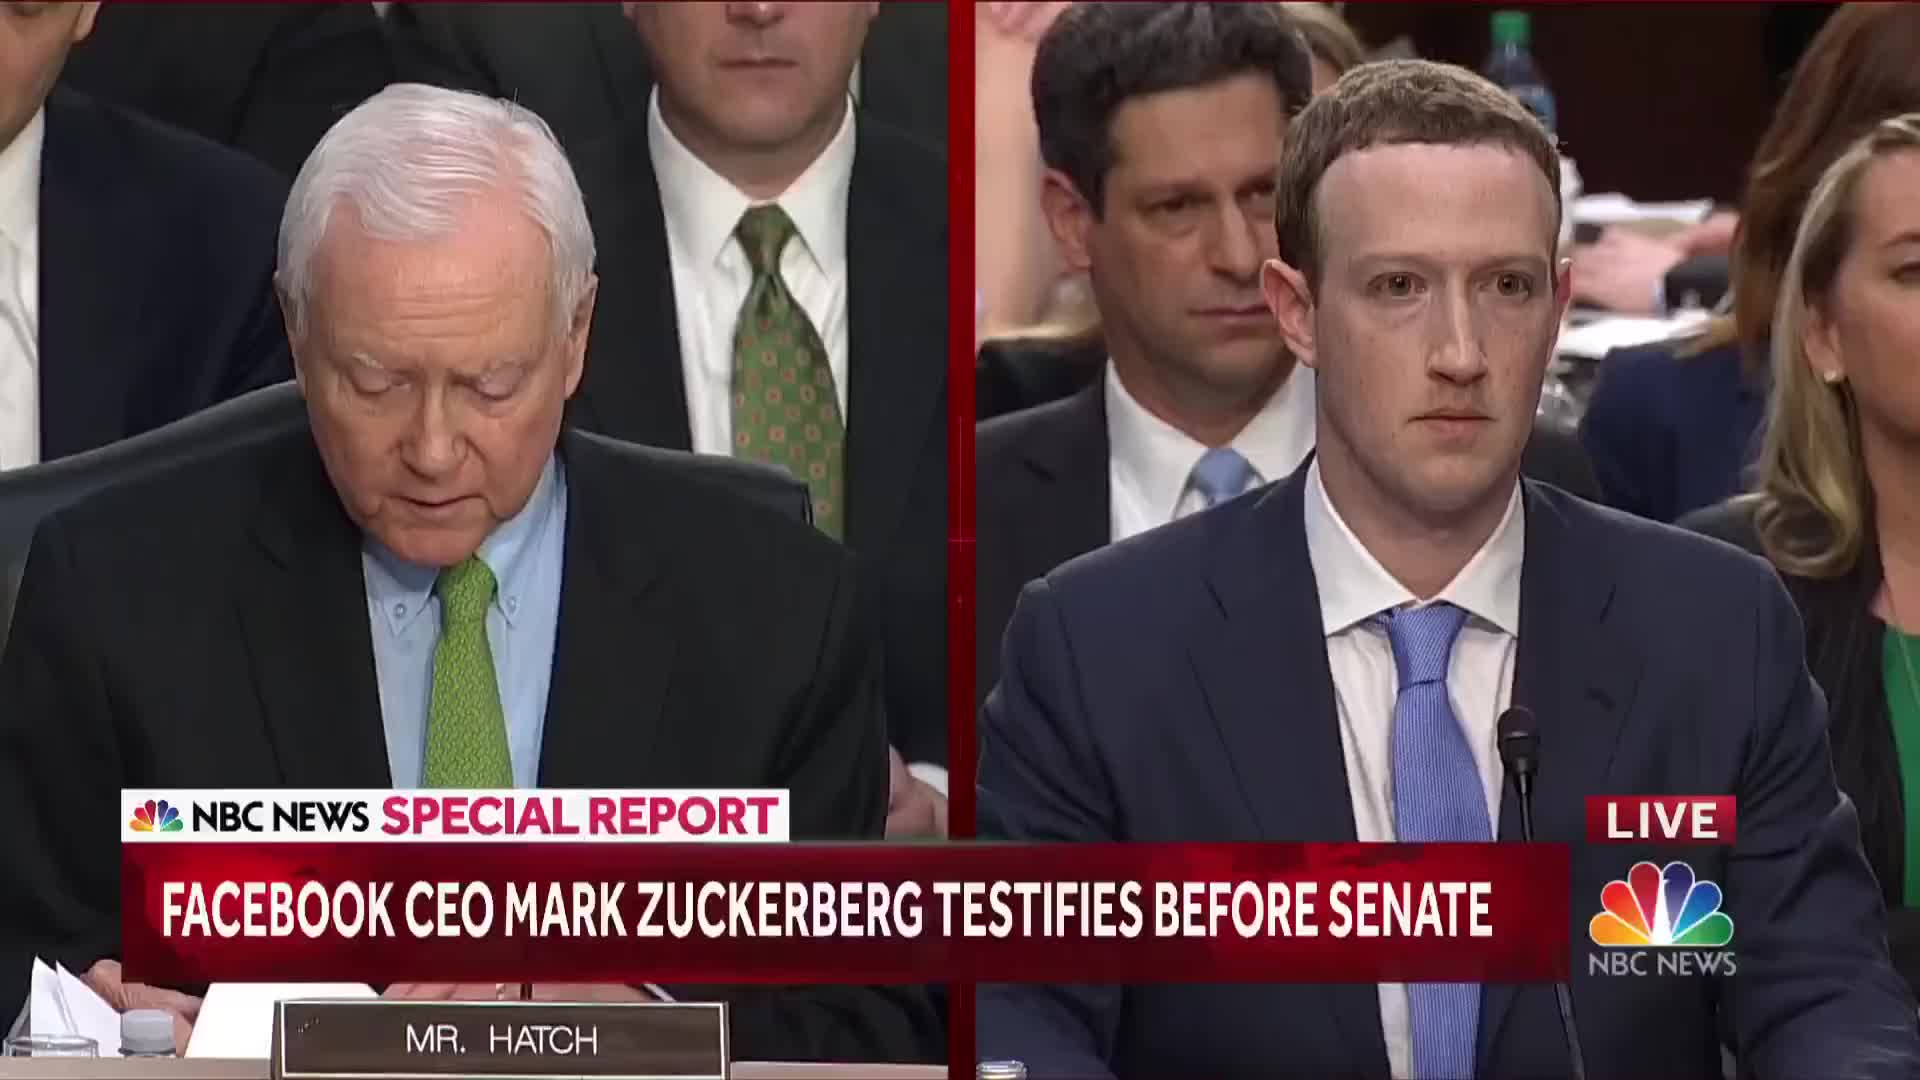 Congress, FB, Facebook, Facebook CEO, Facebook hearing, Mark Zuckerberg, NBC, News, Orrin Harch, Politics, Senate, Senate Judiciary Commitee, Silicon Valley, Social Media, Tech, U.S. News, US Senate, We run Ads, Zuckerberg, Zuckerberg Hearing, Senator Asks How Facebook Remains Free, Mark Zuckerberg Smirks: 'We Run Ads' | NBC News GIFs